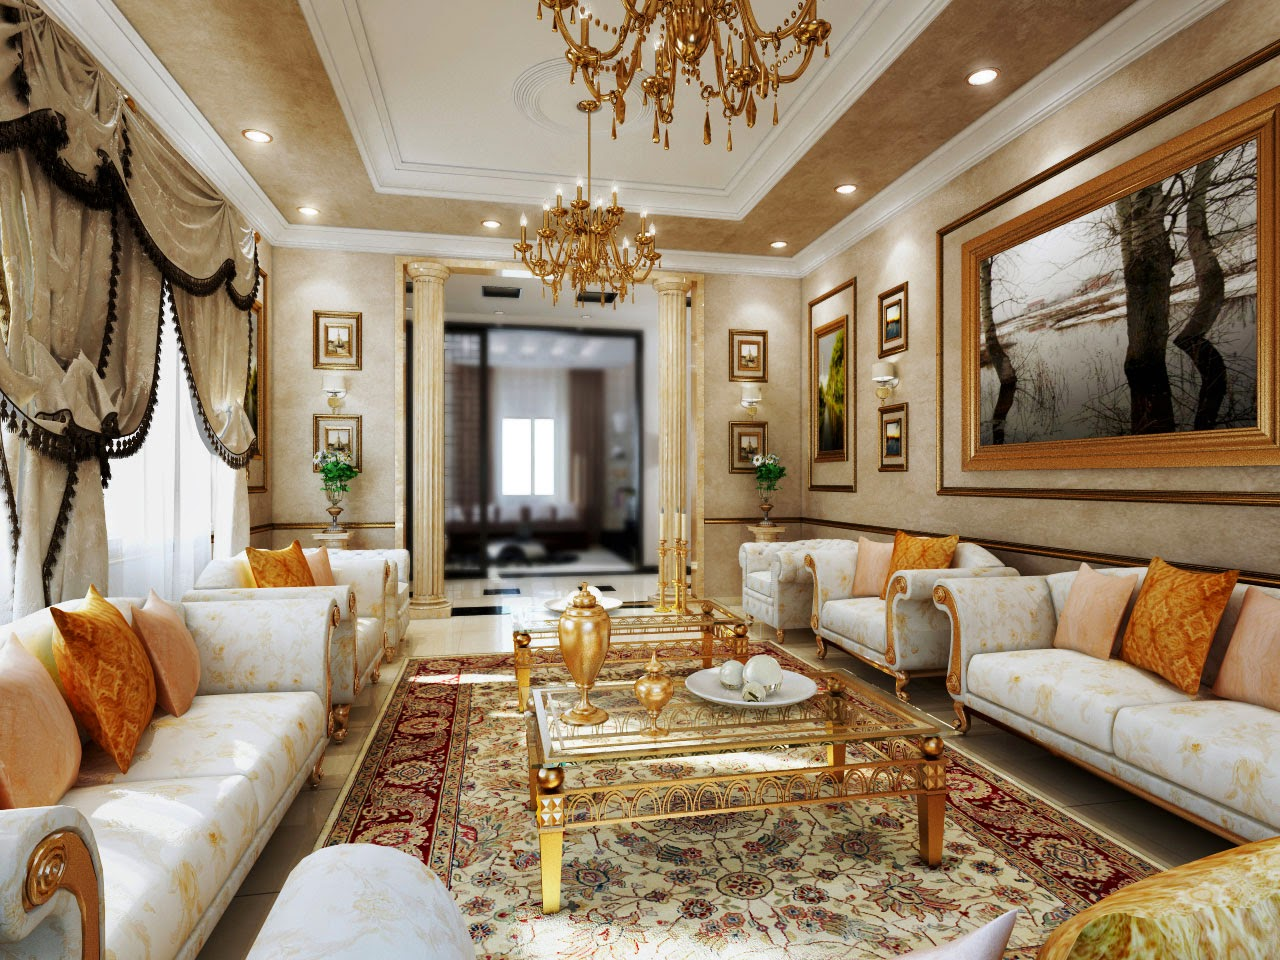 Mengintip Dekorasi Ruang Tamu Rumah Cantik Mungil Minimalis Full